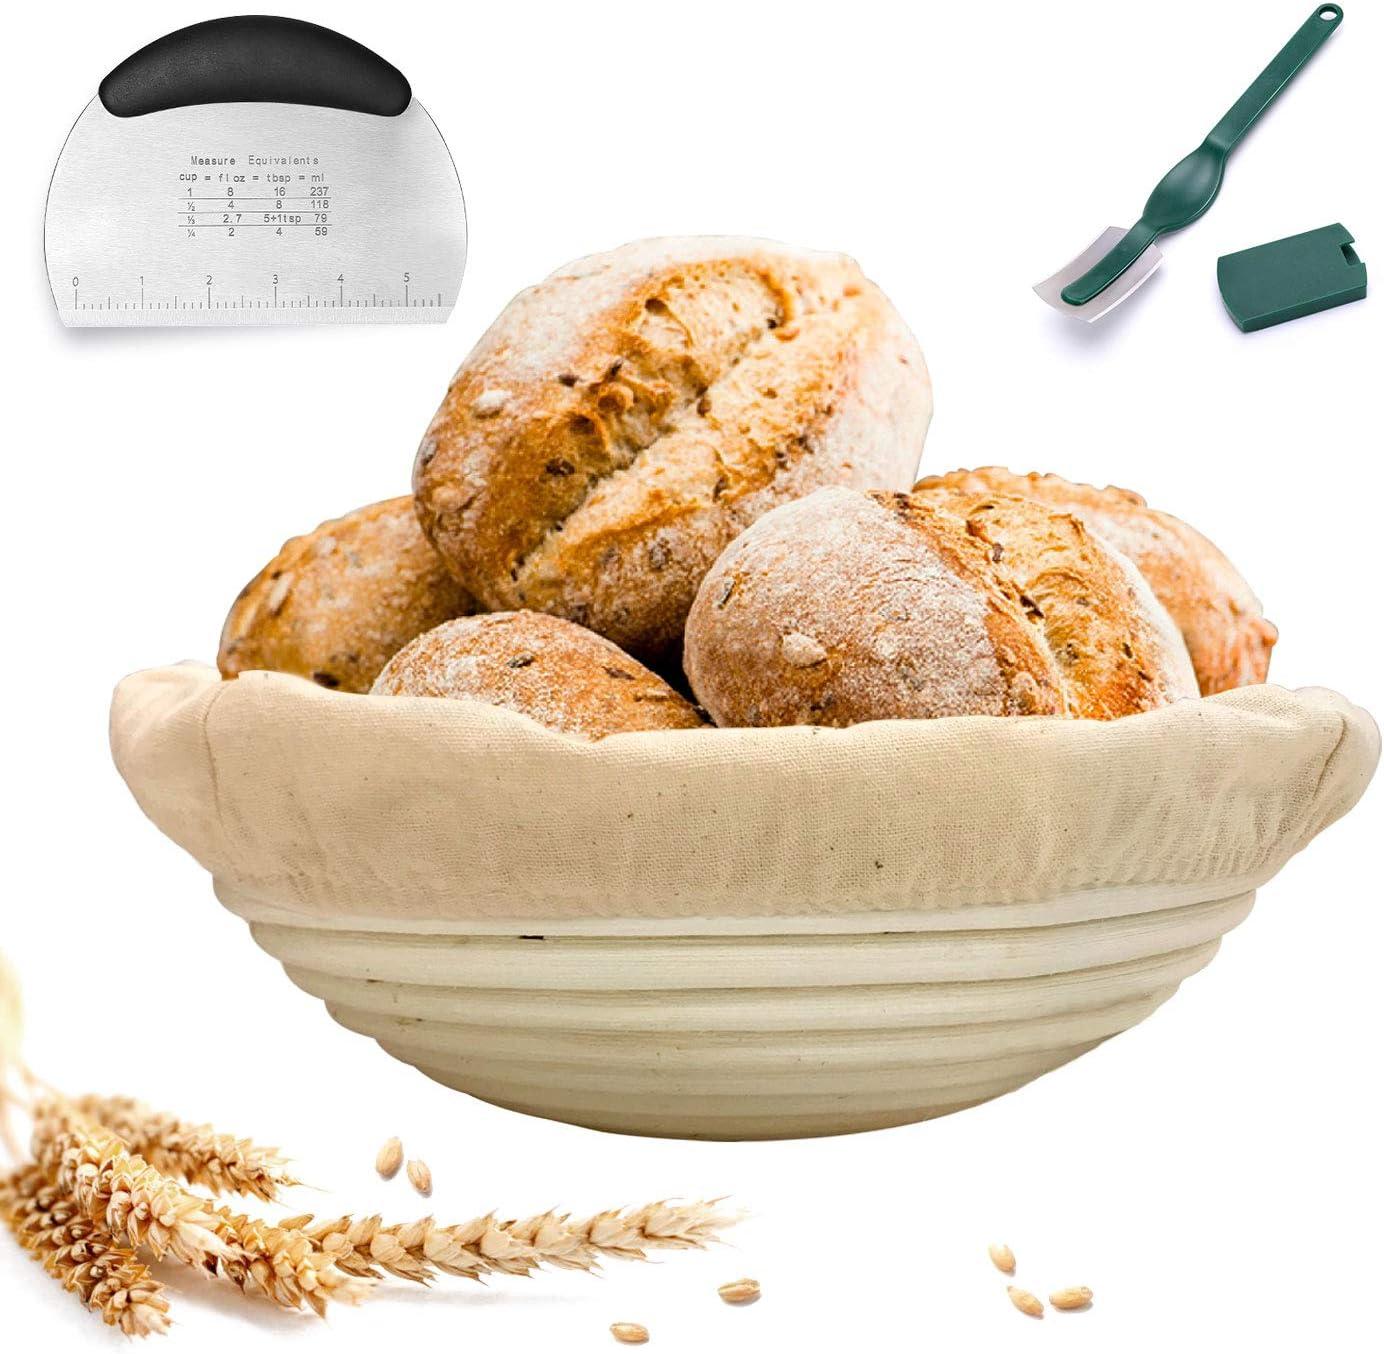 Round Banneton Proofing Bread Basket Brotform for Bread Sourdough Dough with Liner + Dough Scraper + Lame, Sourdough Baking Set for Making Artisan Homemade Bread (9.8inch)